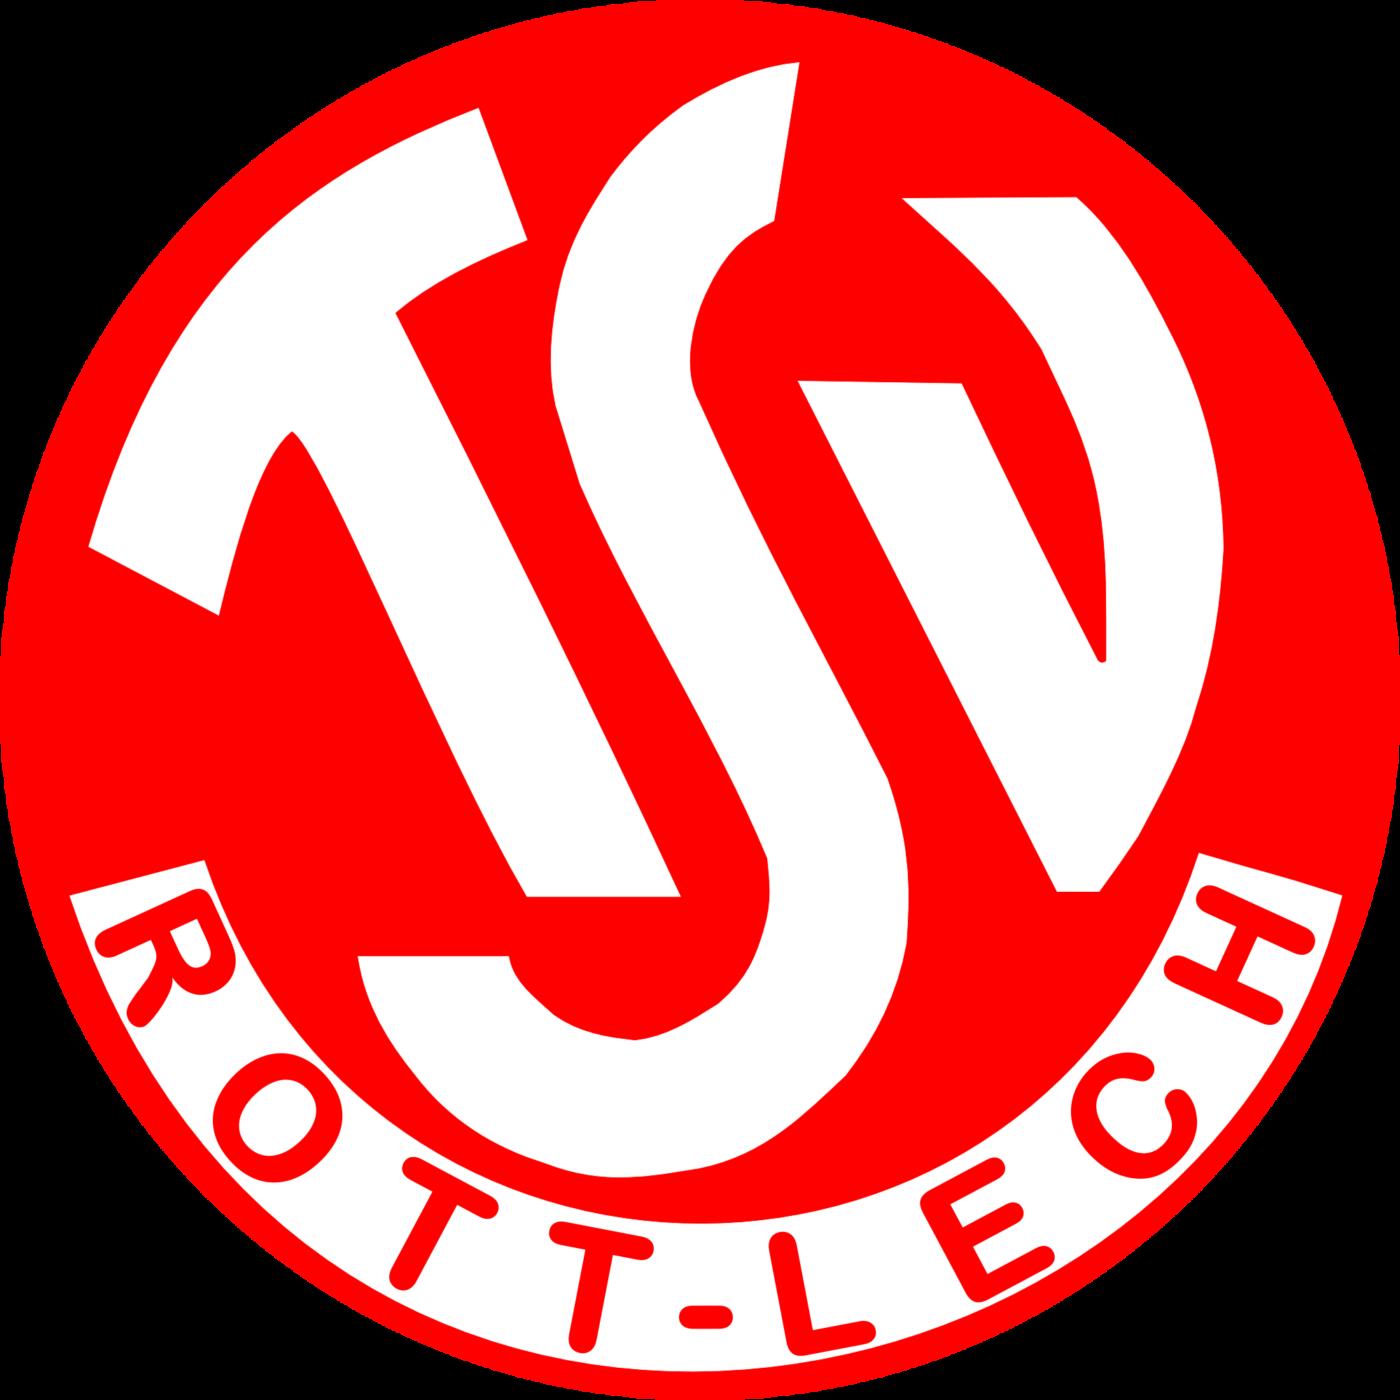 Bild für TSV Rott/Lech